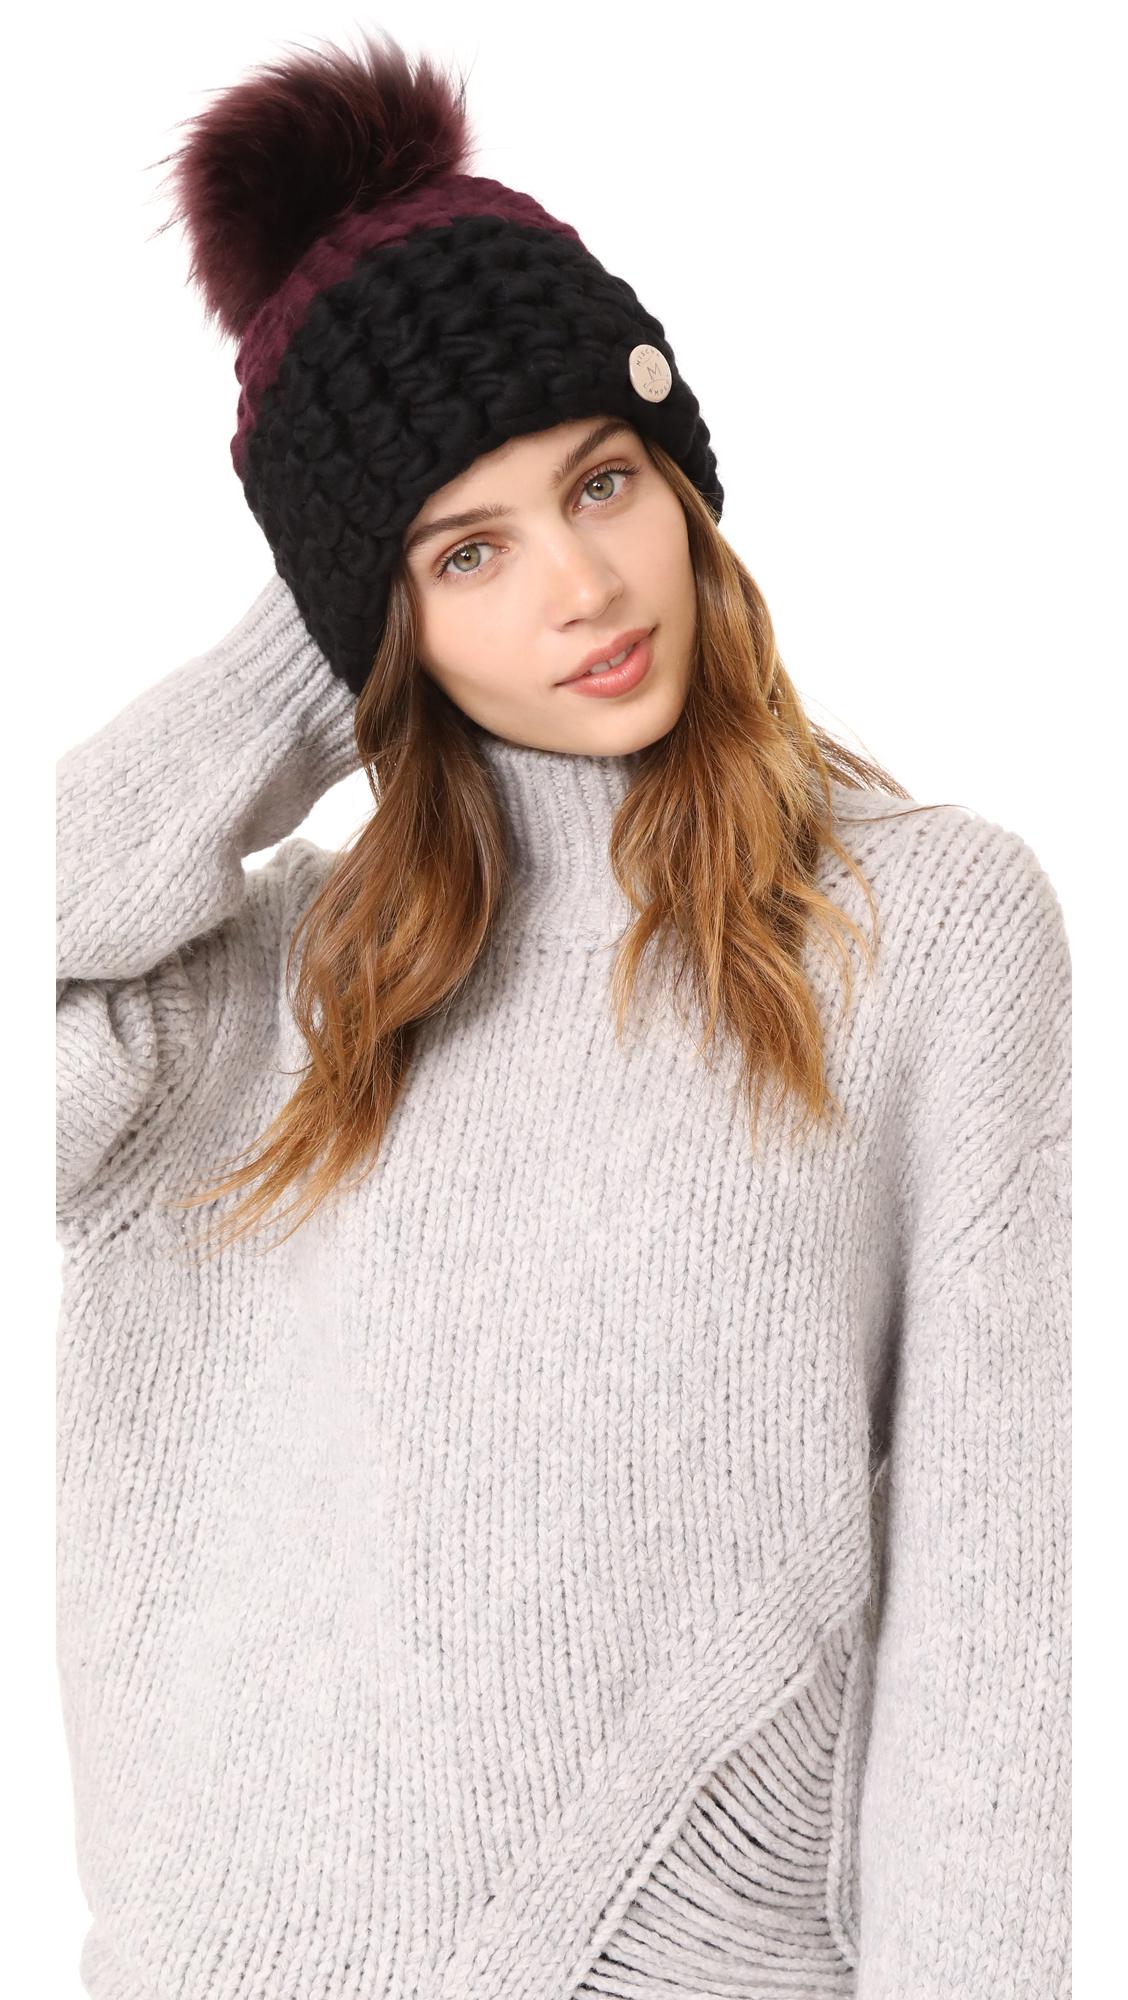 Mischa Lampert Deep Beanie Colorblock Hat - Aubergine/Black/Mauve